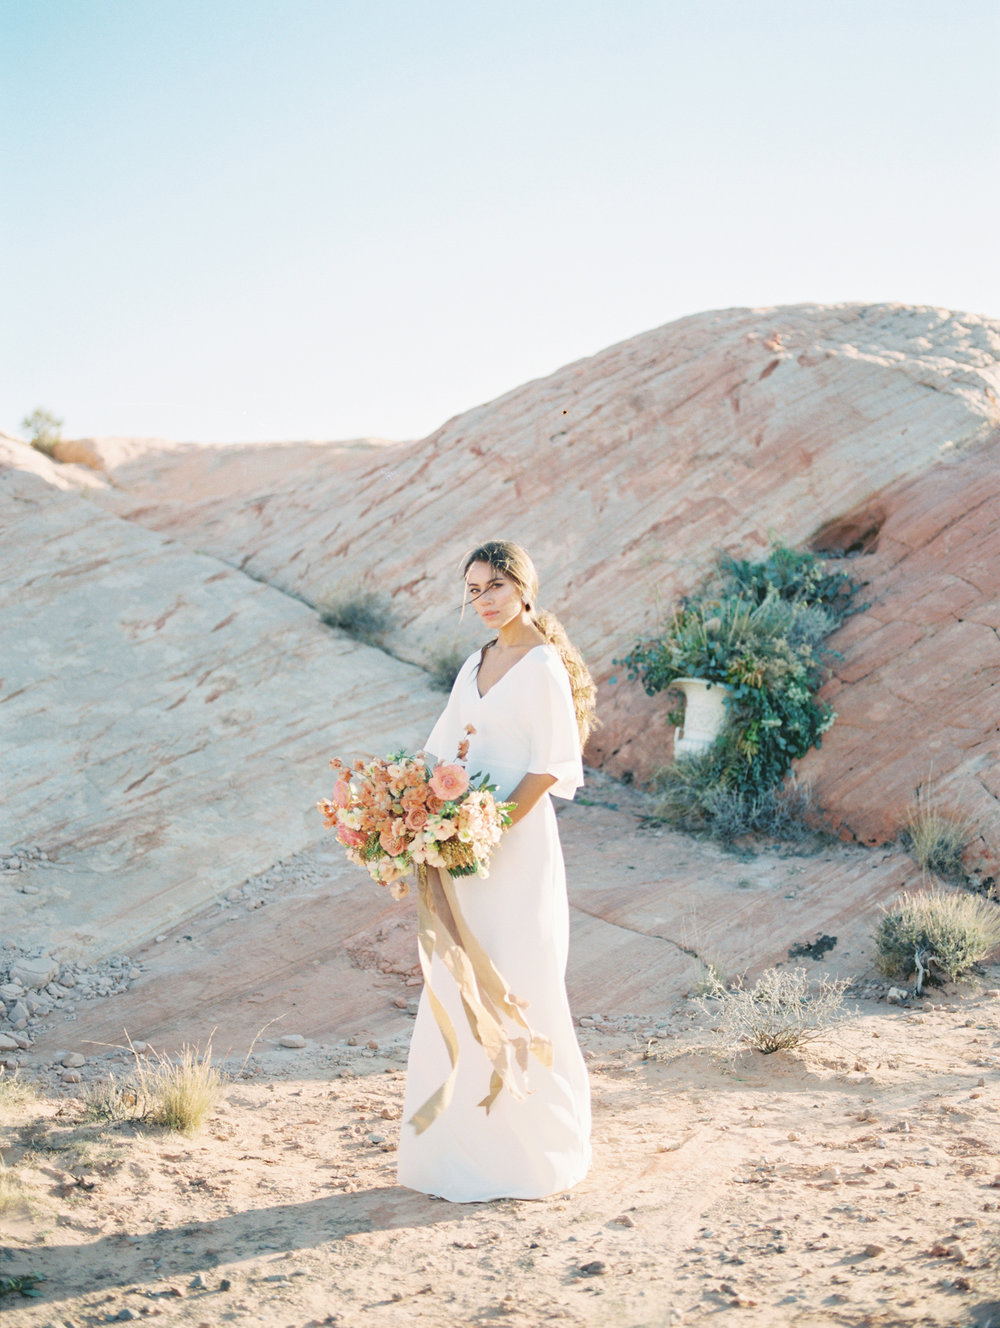 AKP_Desert_Wedding_Bridal_Shoot_Film_Fine_Art_Wedding_Photographer_Los_Angeles-12.jpg